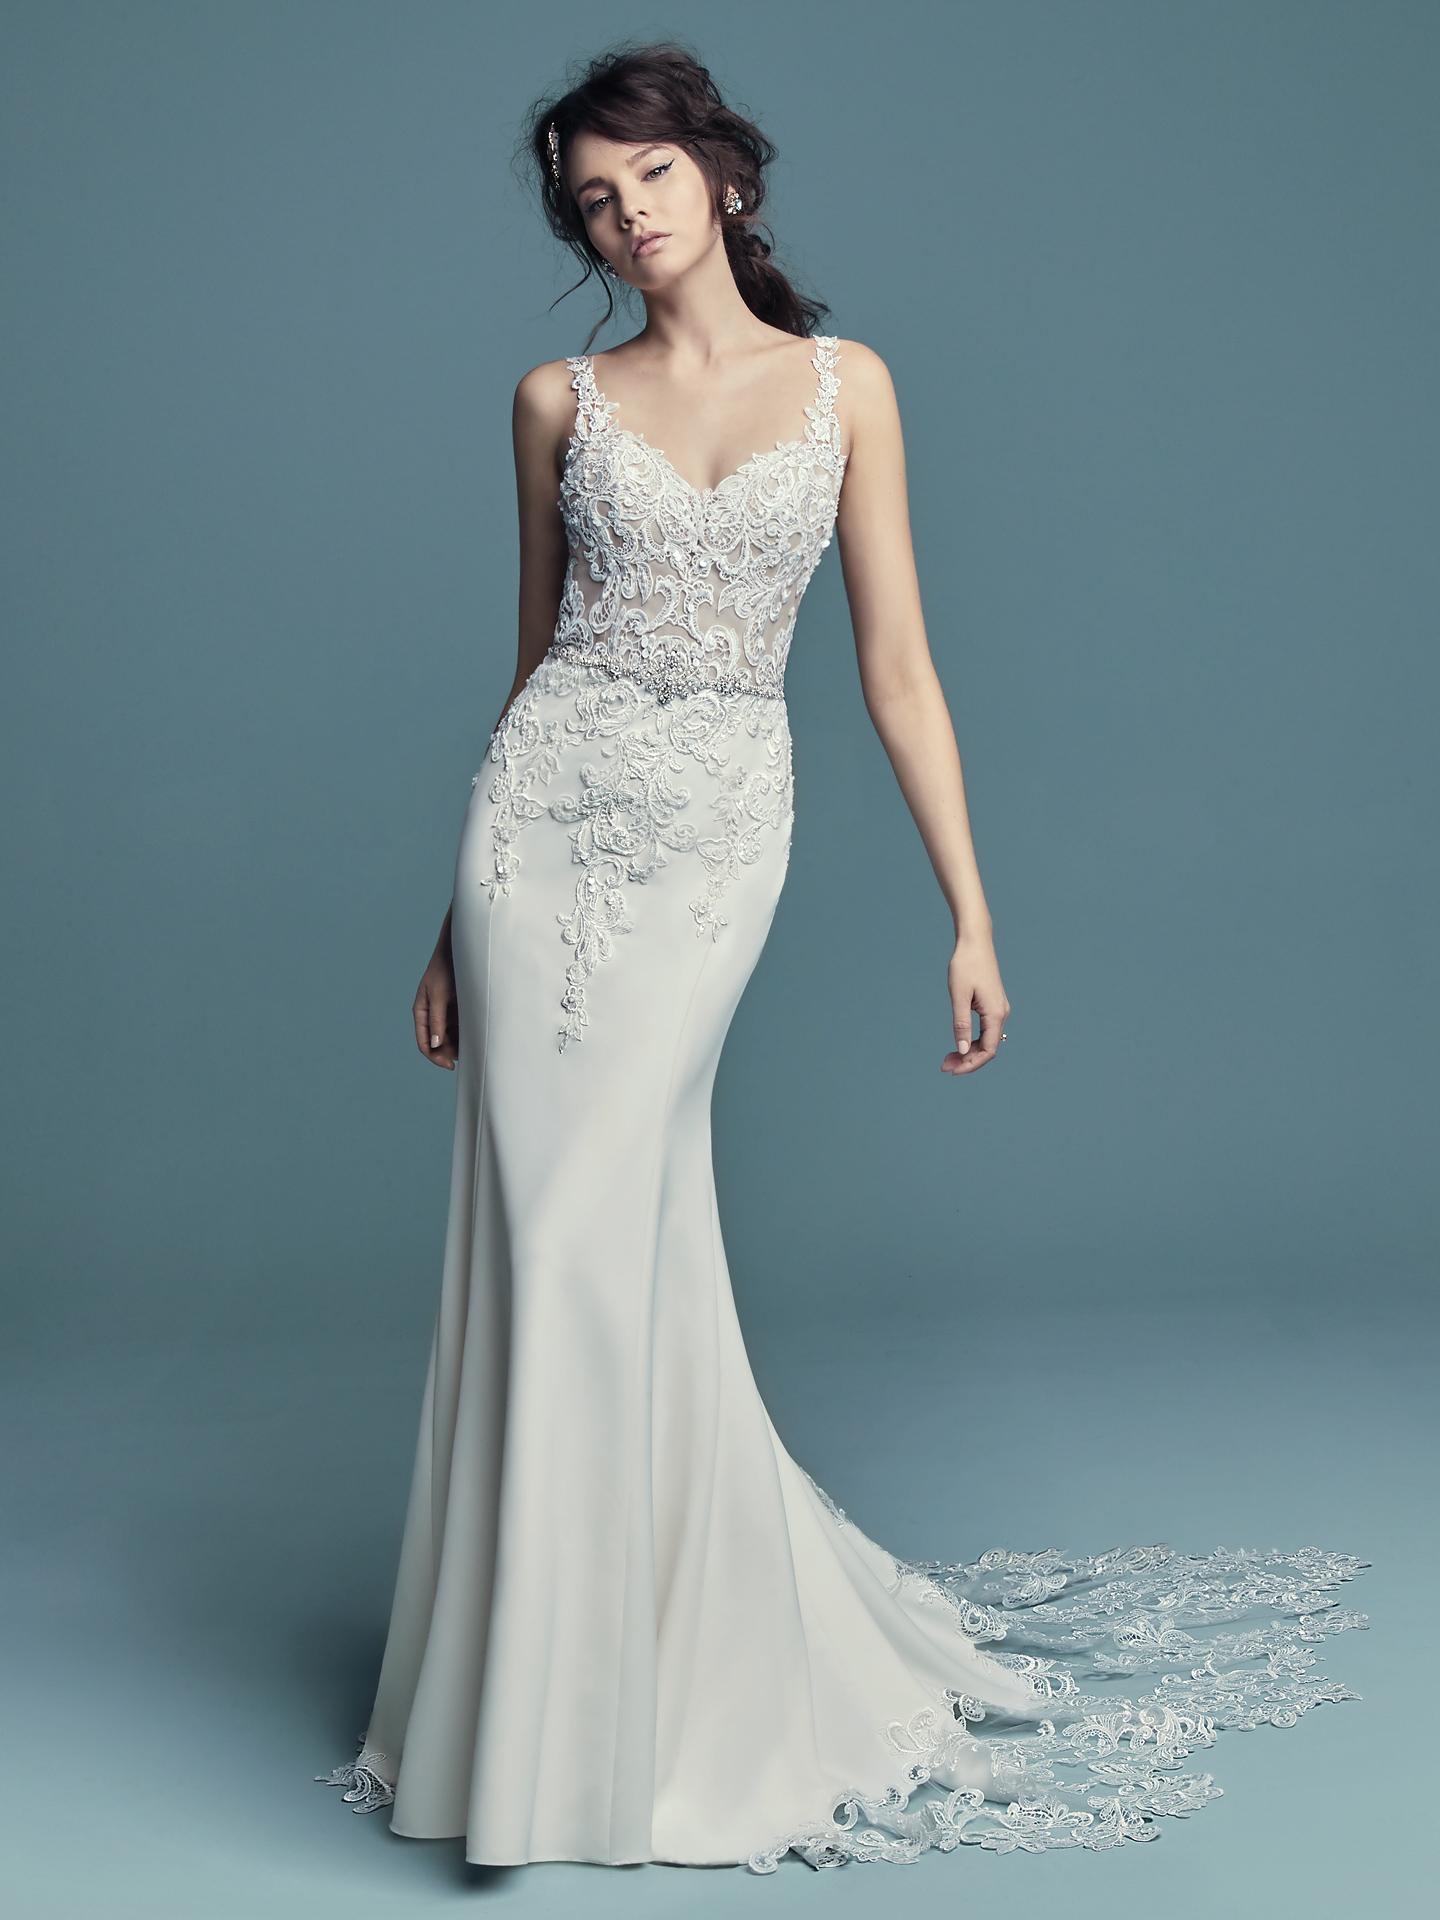 Alaina-Maggie-Sottero-Dress-Finder